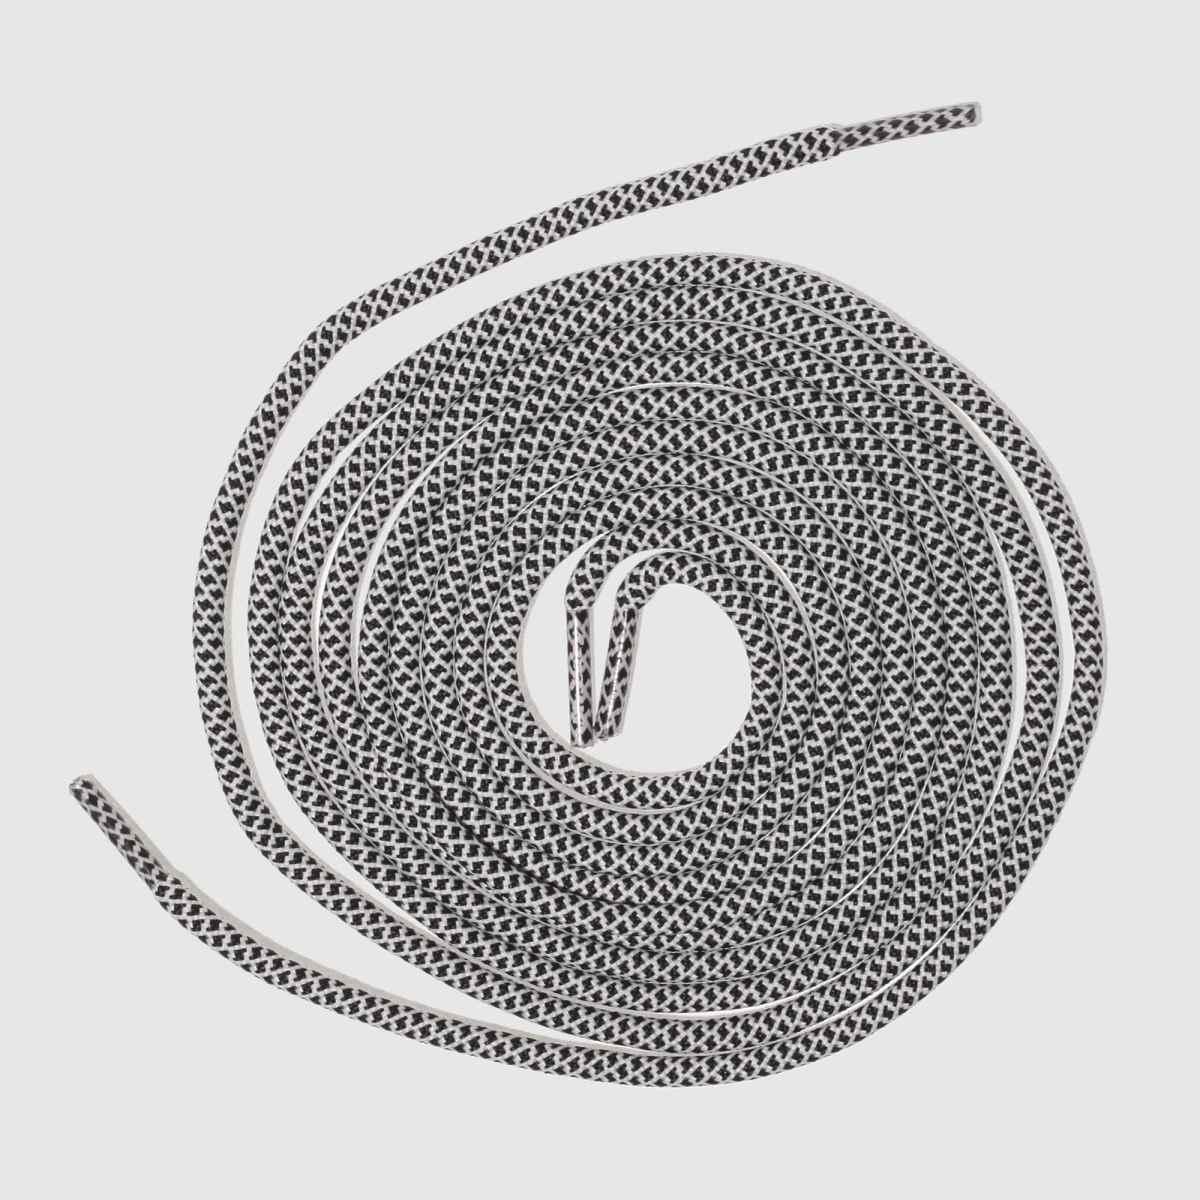 mr lacy black & white ropies